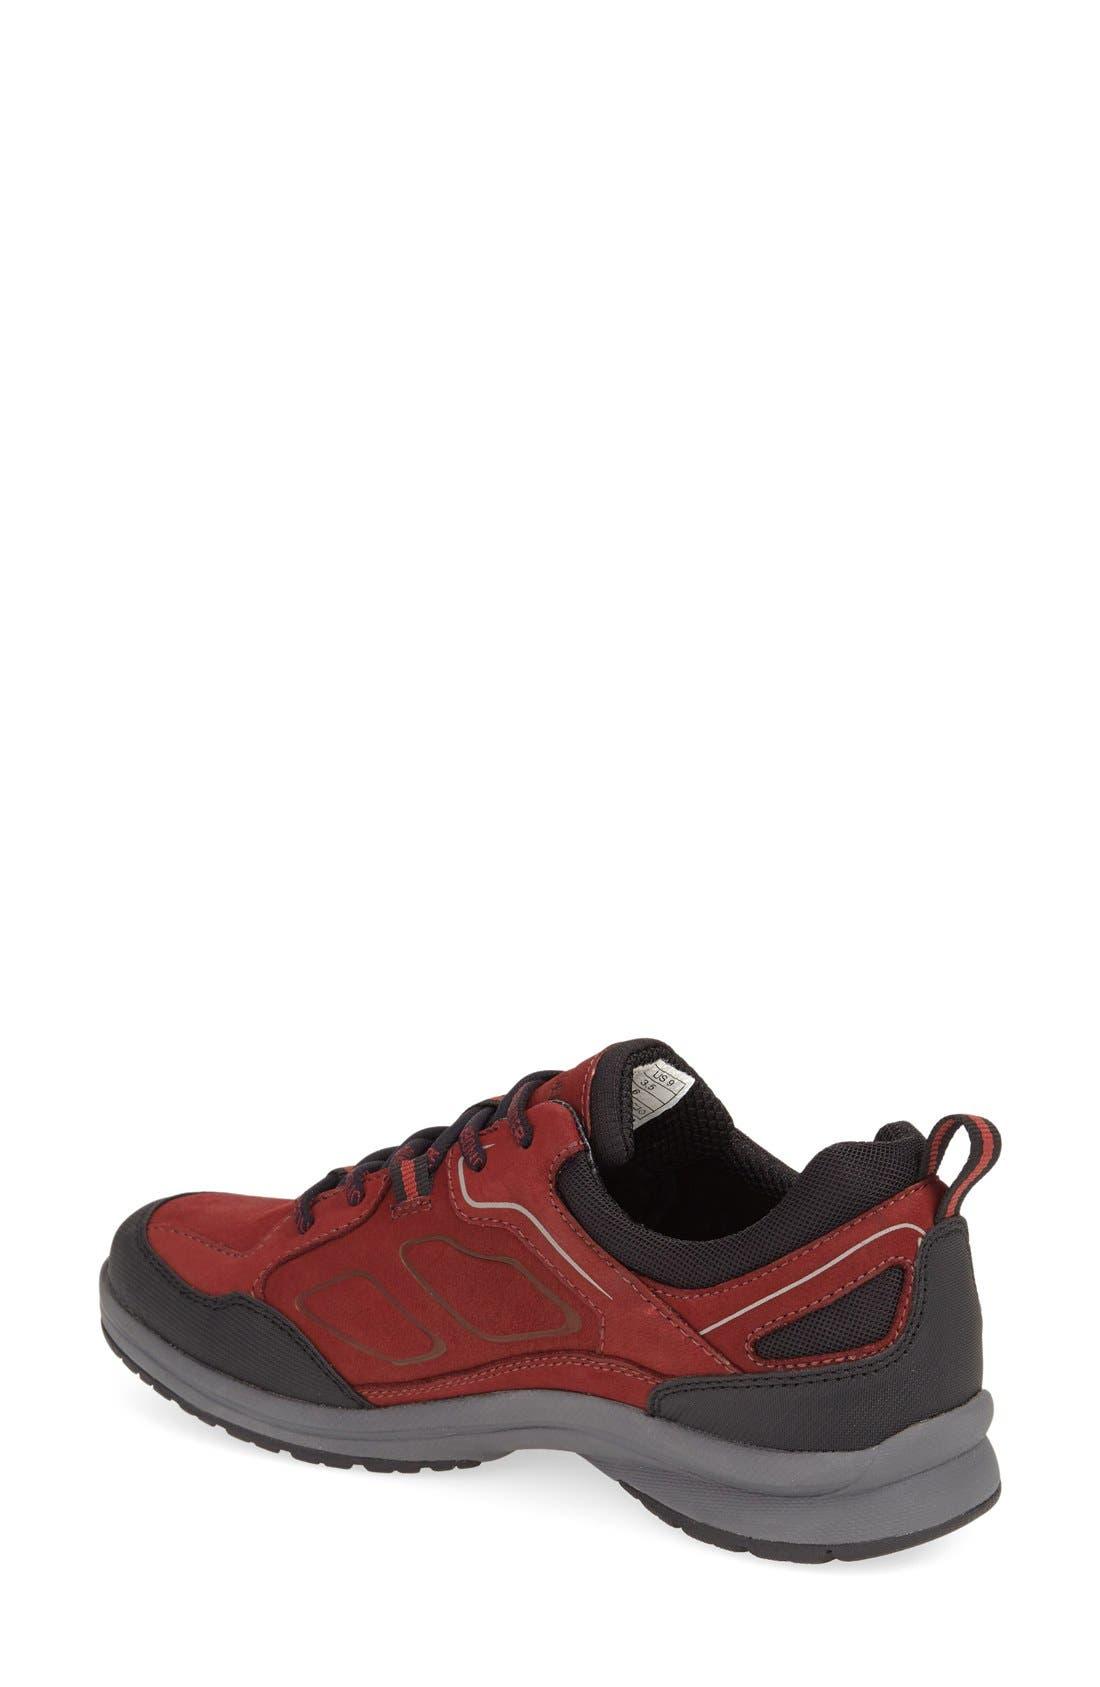 'Dascha Tex' Waterproof Sneaker,                             Alternate thumbnail 2, color,                             BLACK/ RED NUBUCK LEATHER